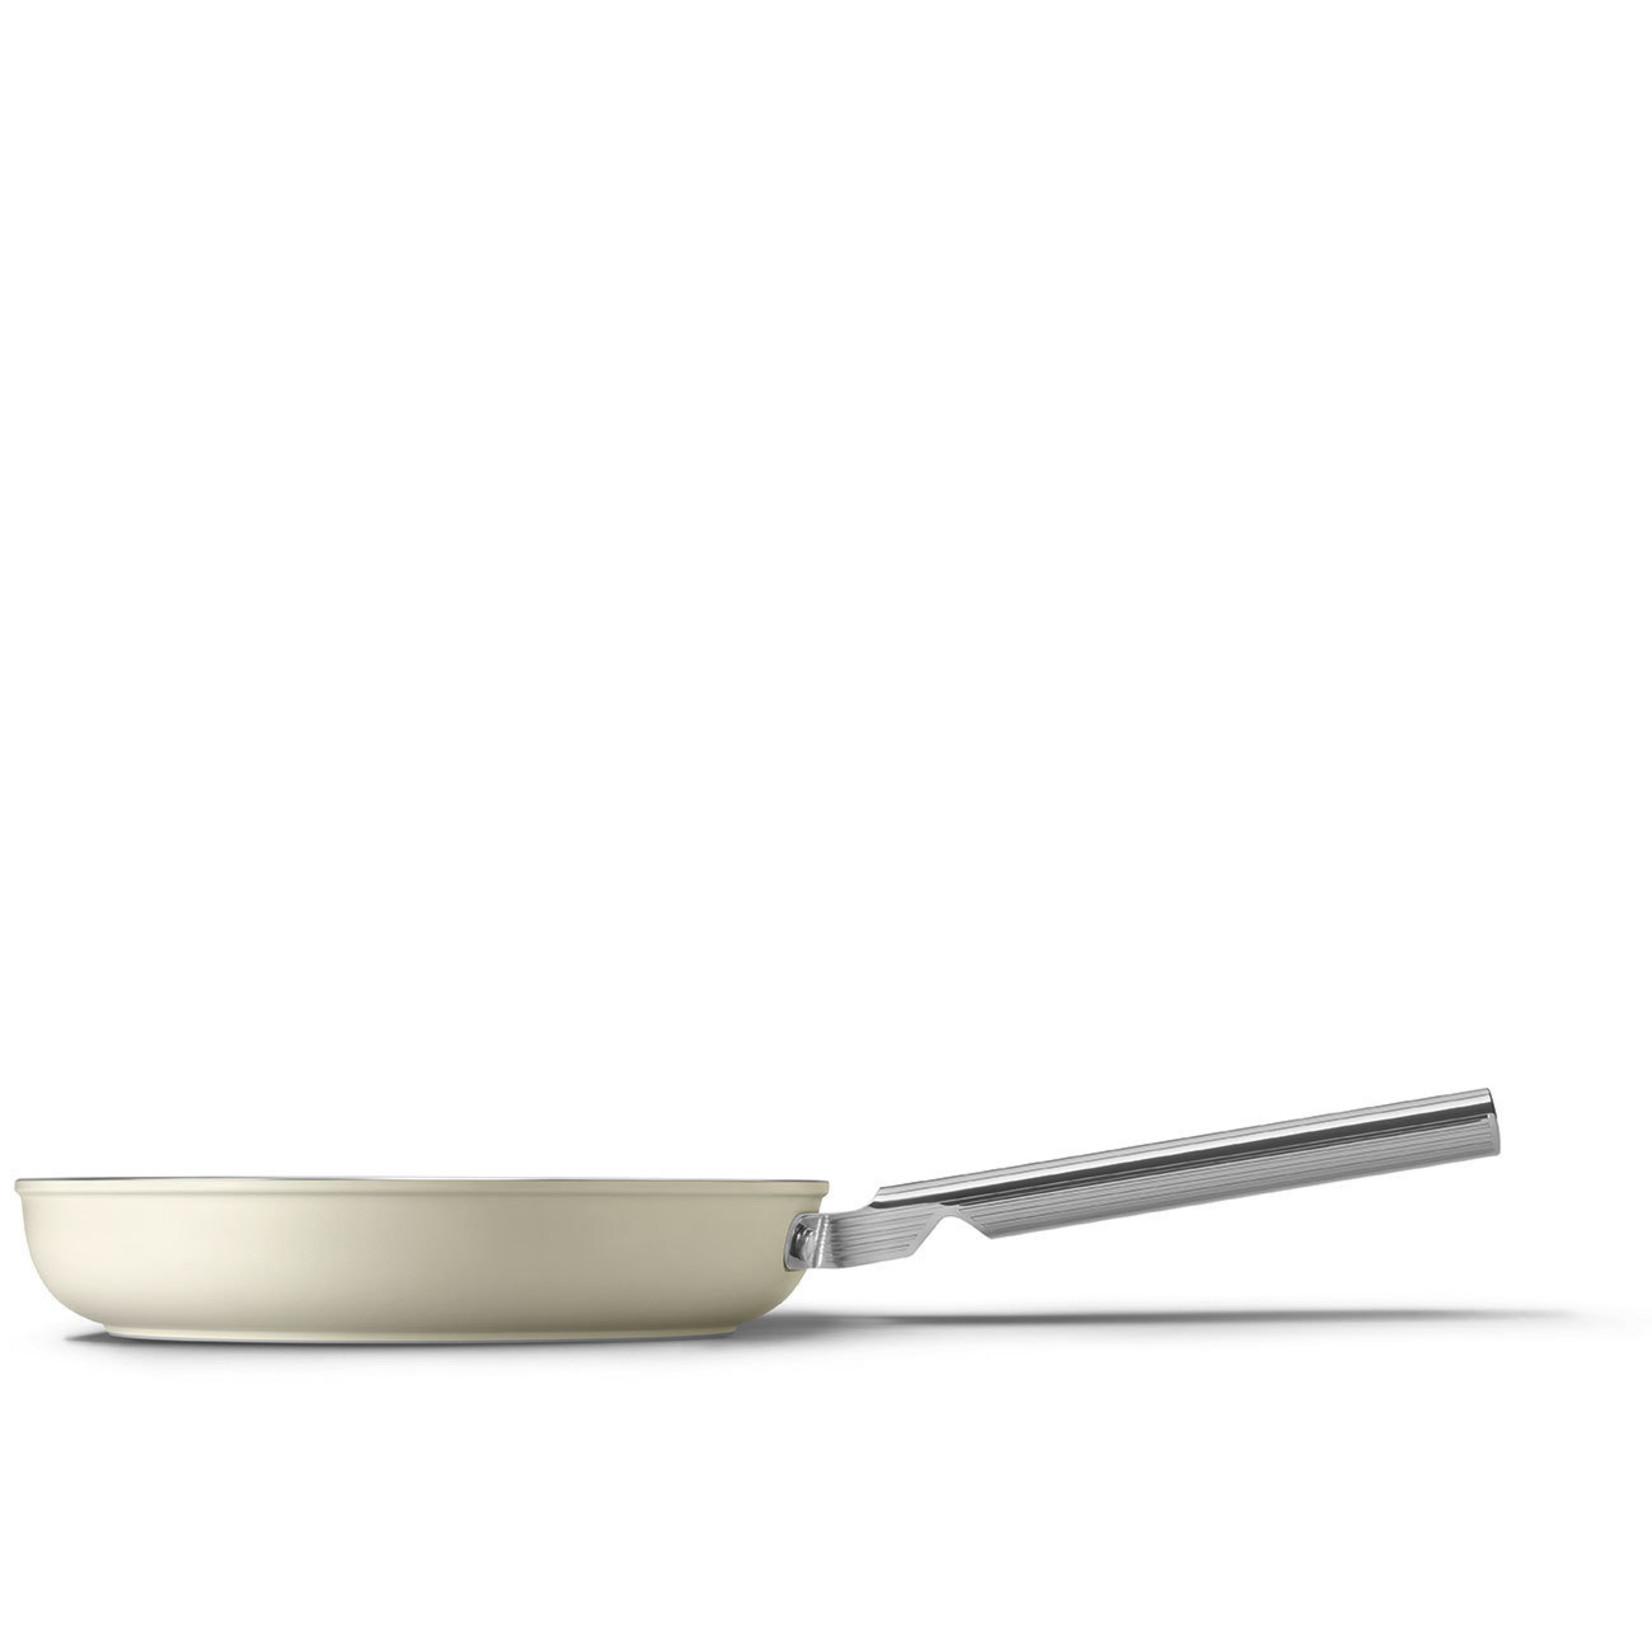 Smeg SMEG Koekenpan 26 cm, anti-aanbaklaag, crème mat